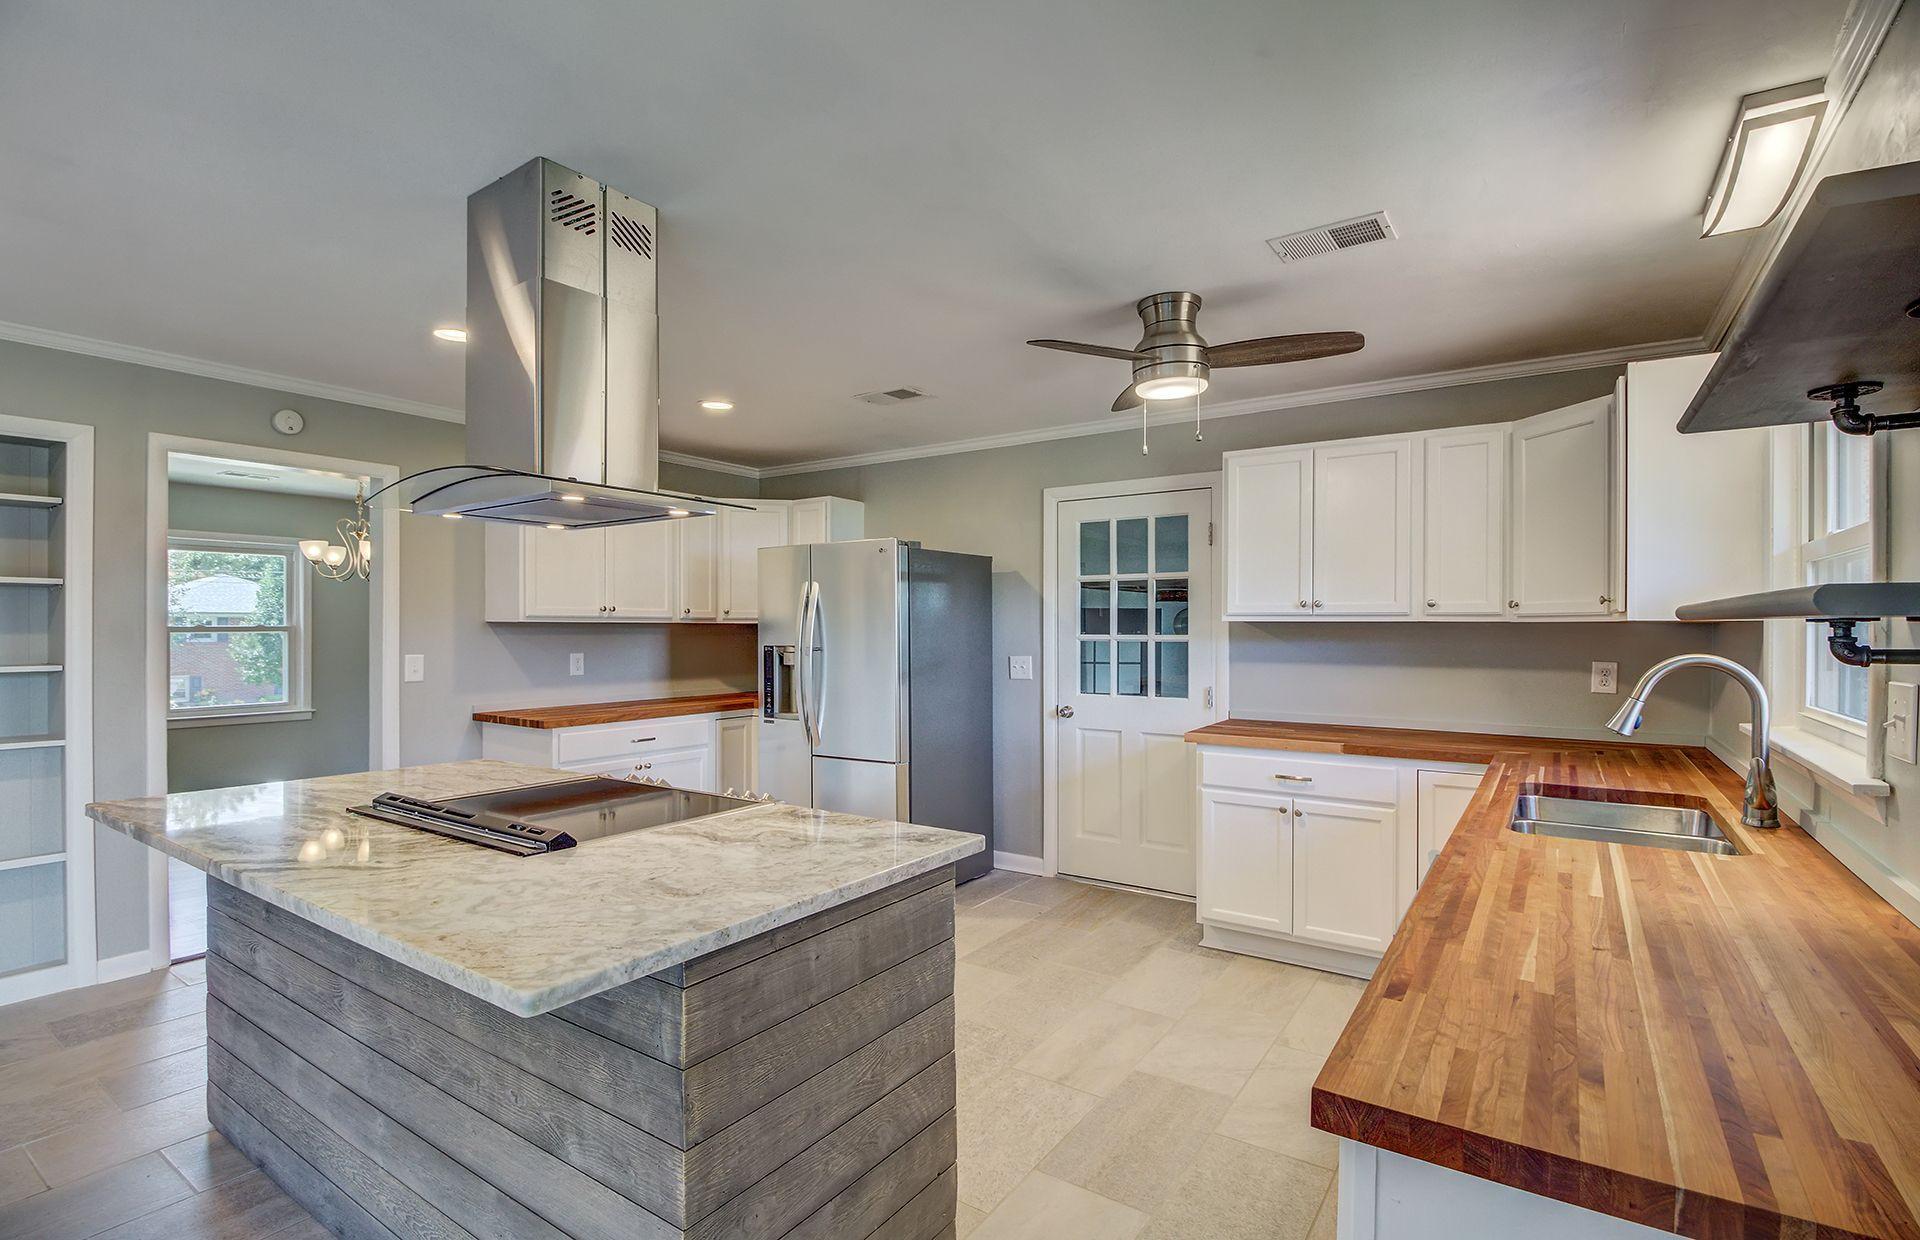 Belvedere Estates Homes For Sale - 6010 Ridgecrest, Hanahan, SC - 5